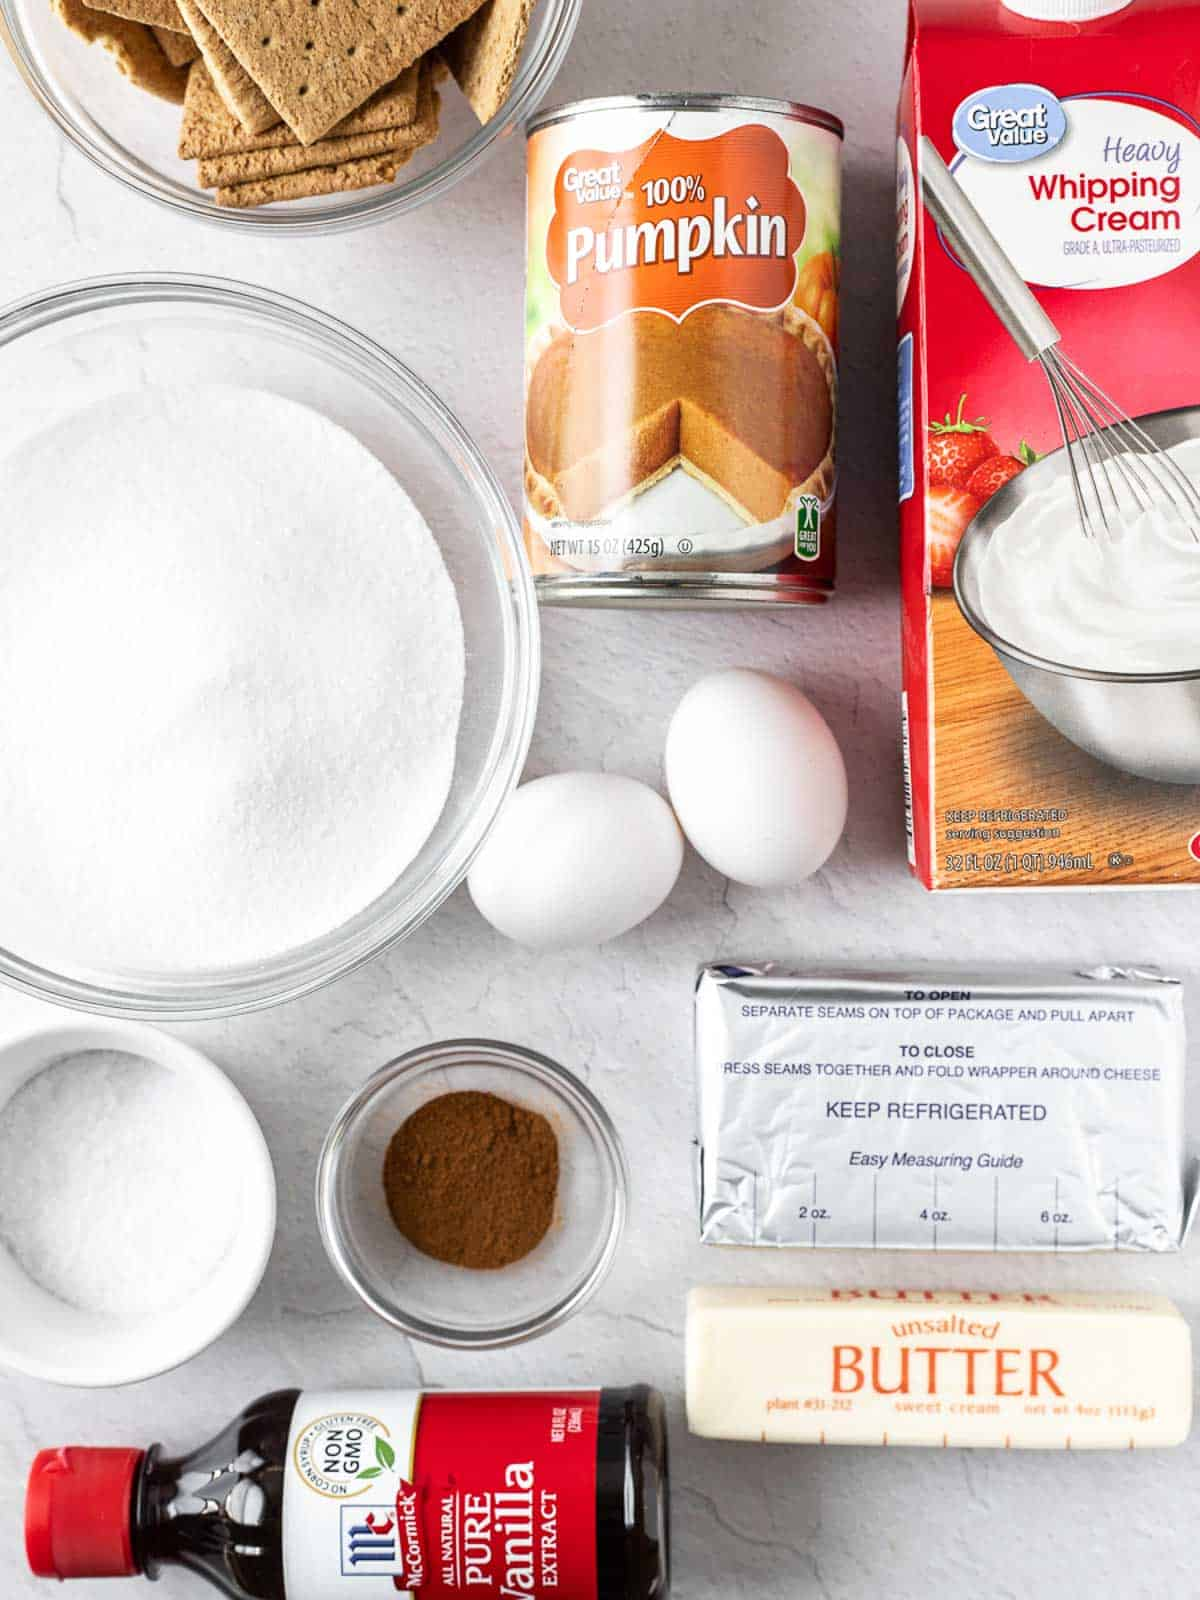 ingredients of the Cheesecake Swirled Pumpkin Bars